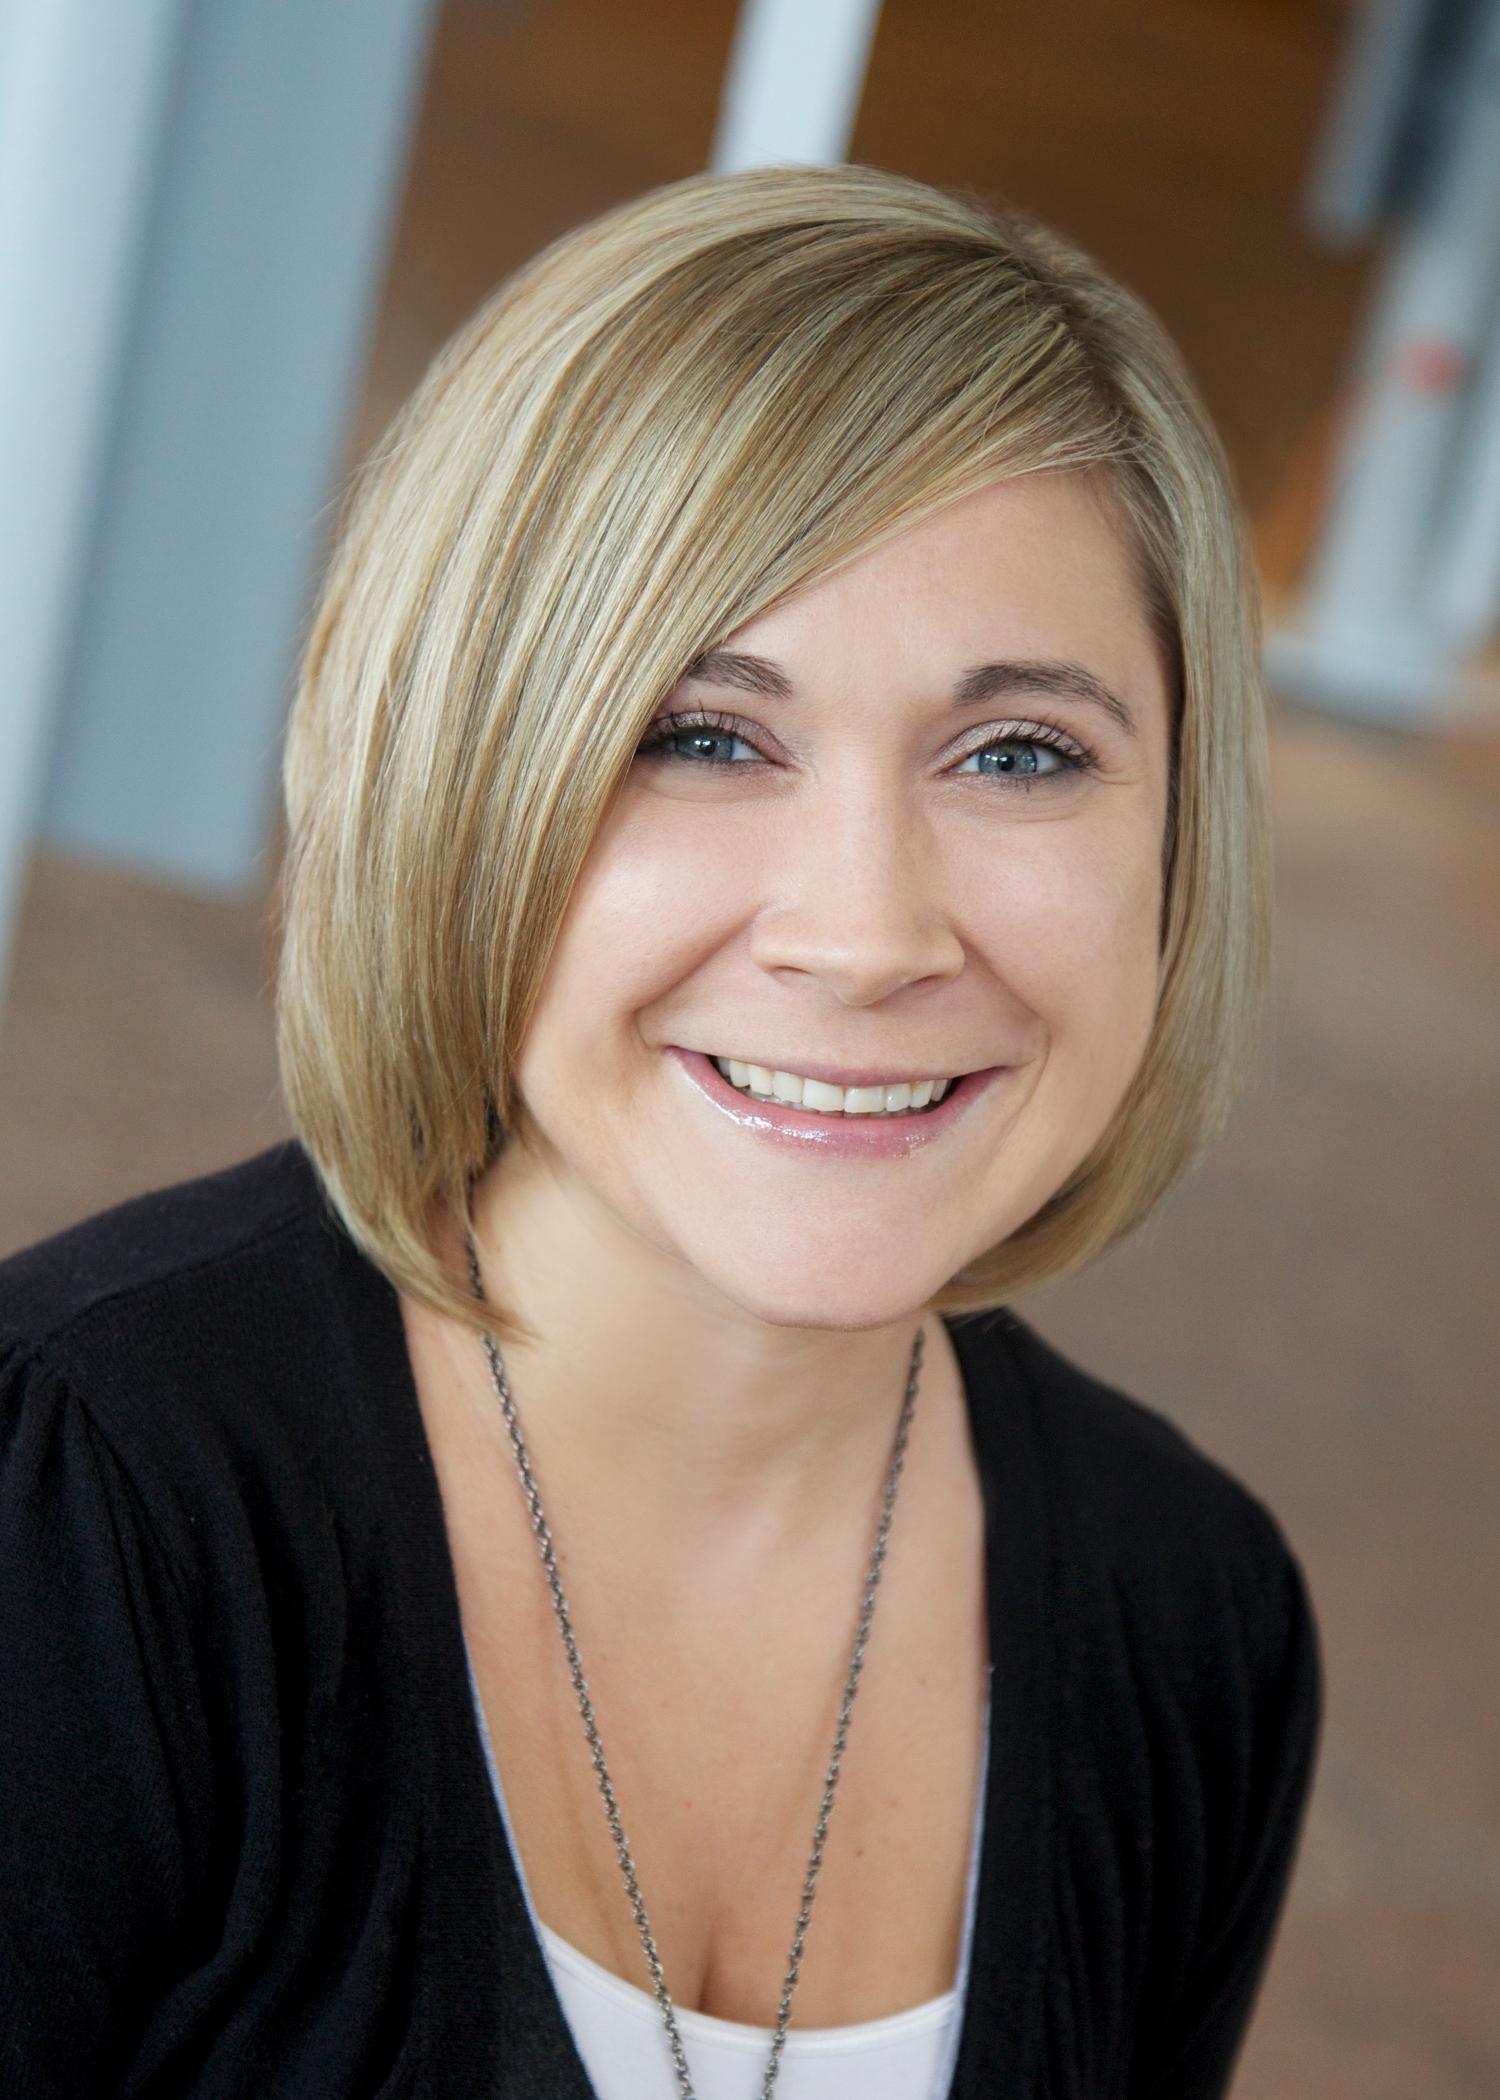 Krista Tillman